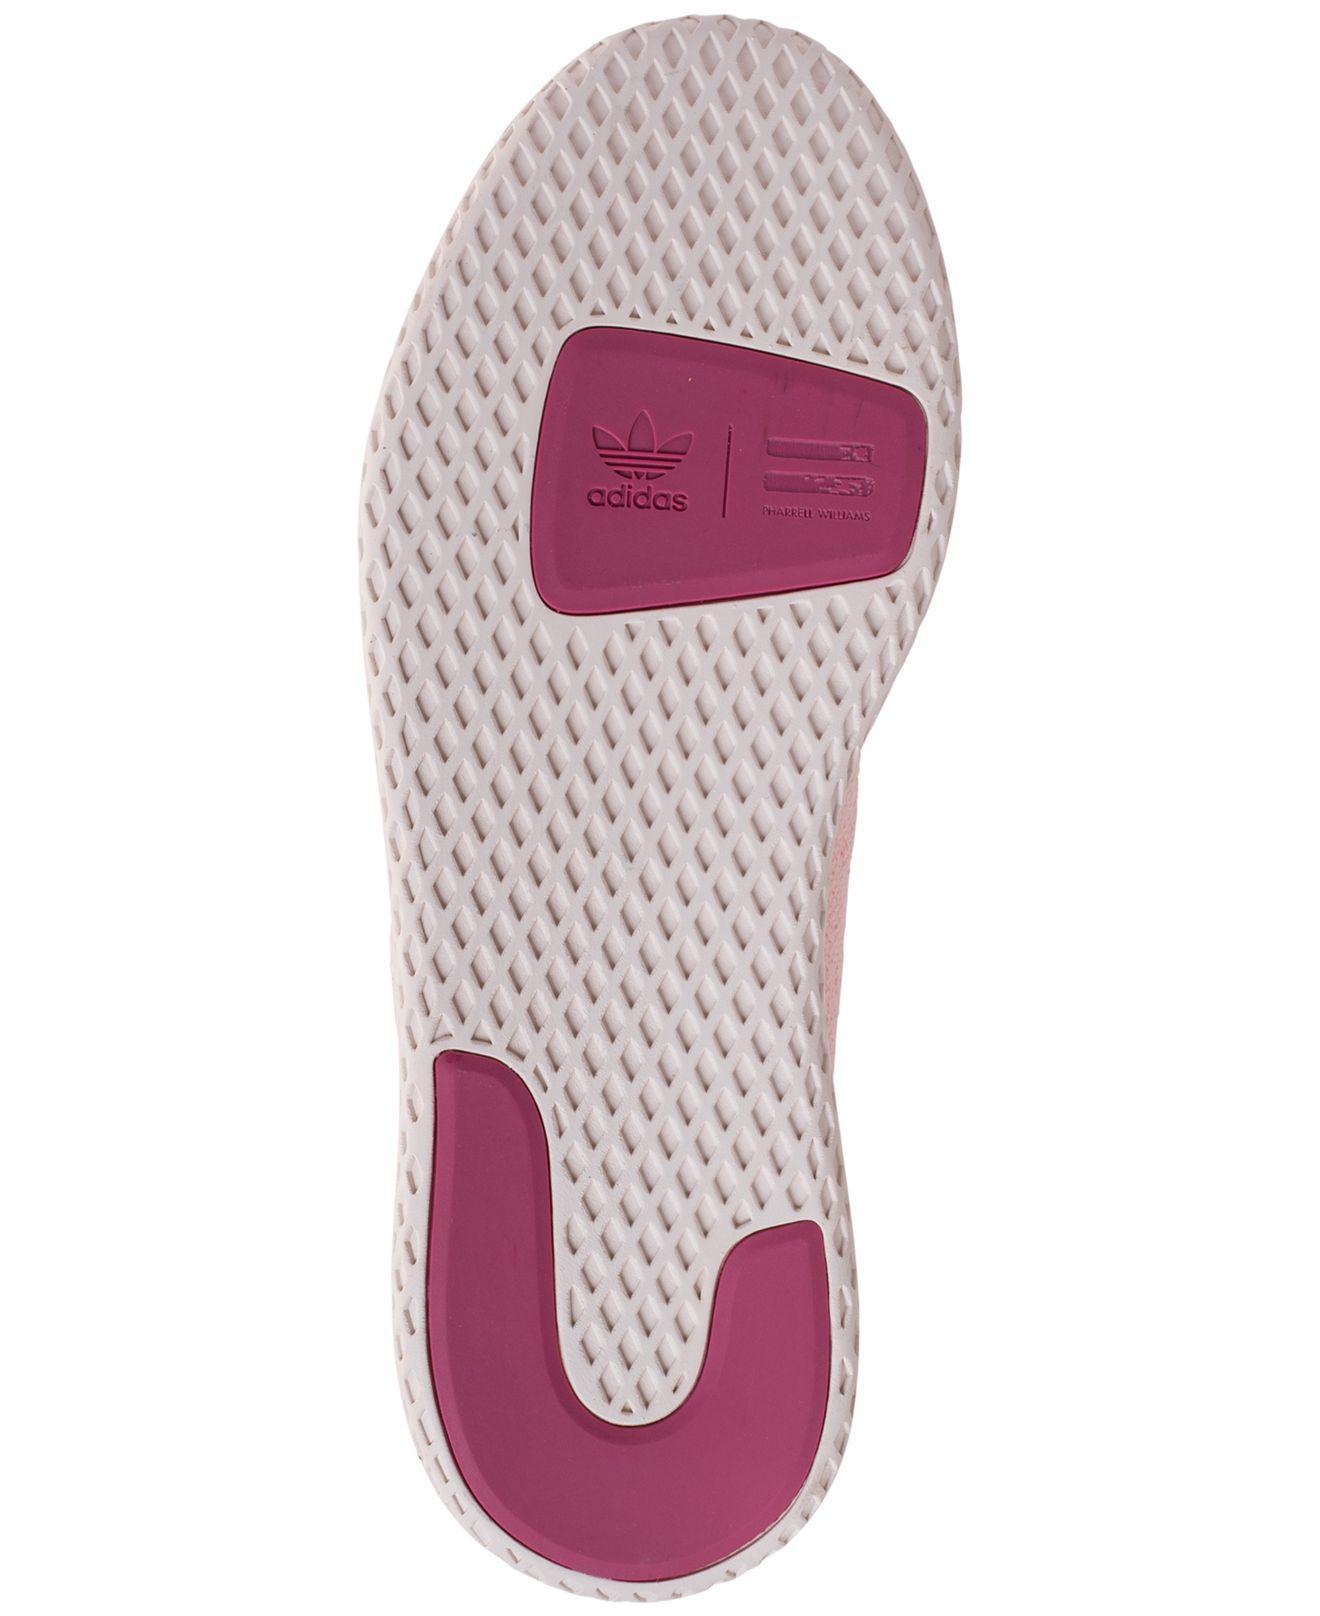 b8fcc065b Lyst - adidas Originals Pharrell Williams Tennis Hu Casual Sneakers ...